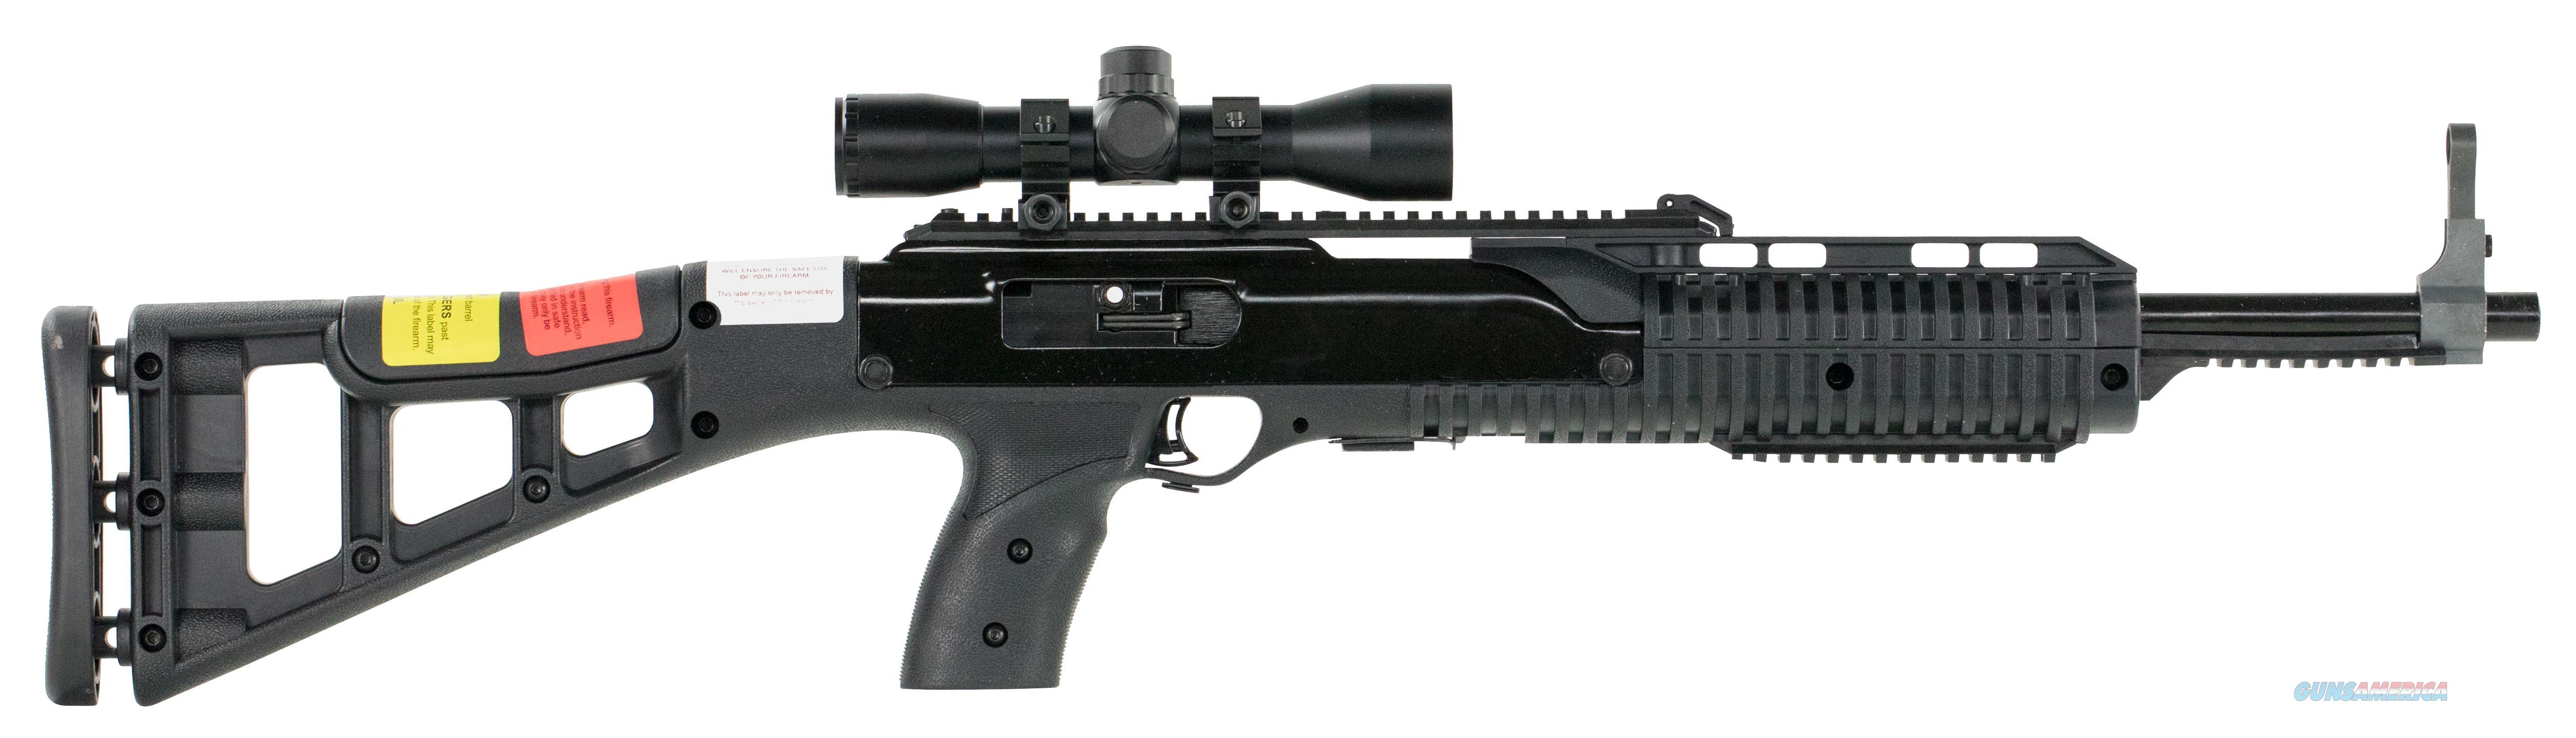 "Hi-Point 4595Ts4x32 4595Ts Carbine Semi-Automatic 45 Automatic Colt Pistol (Acp) 17.5"" 9+1 W/4X32 Scope Polymer Skeleton Black Stk Black 4595TS4X32  Guns > Rifles > H Misc Rifles"